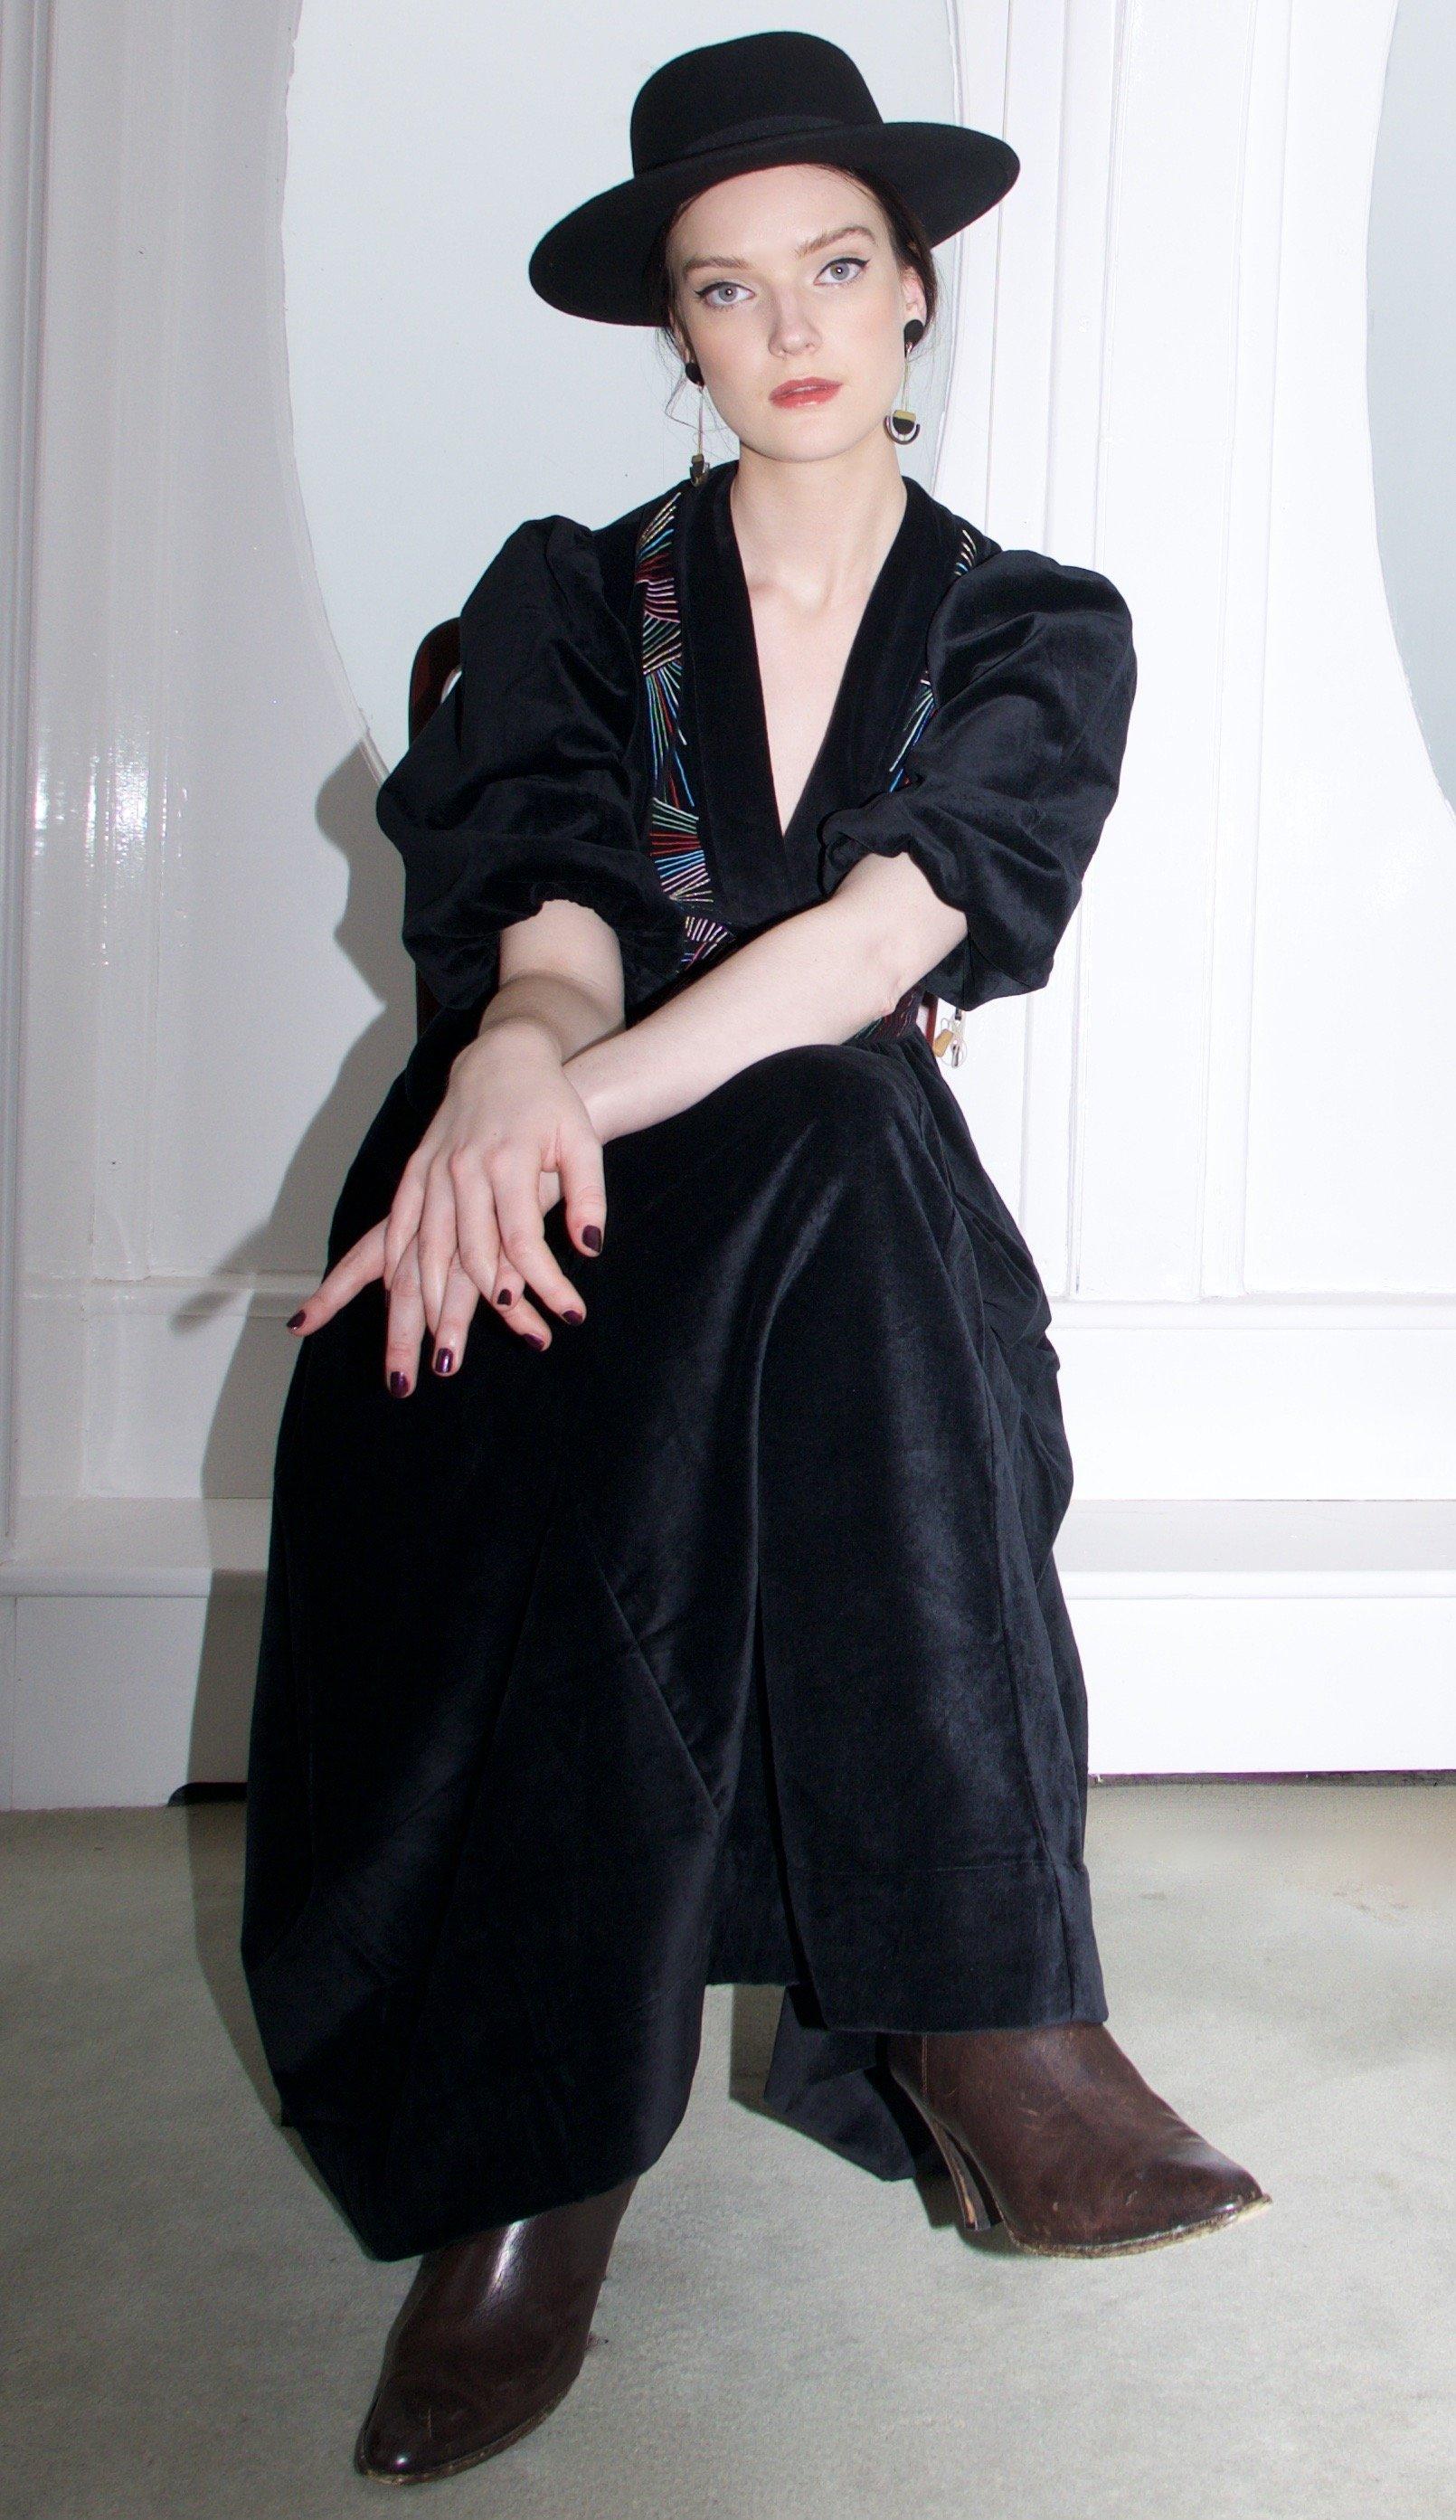 Lola dress black by Tallulah & Hope - 4